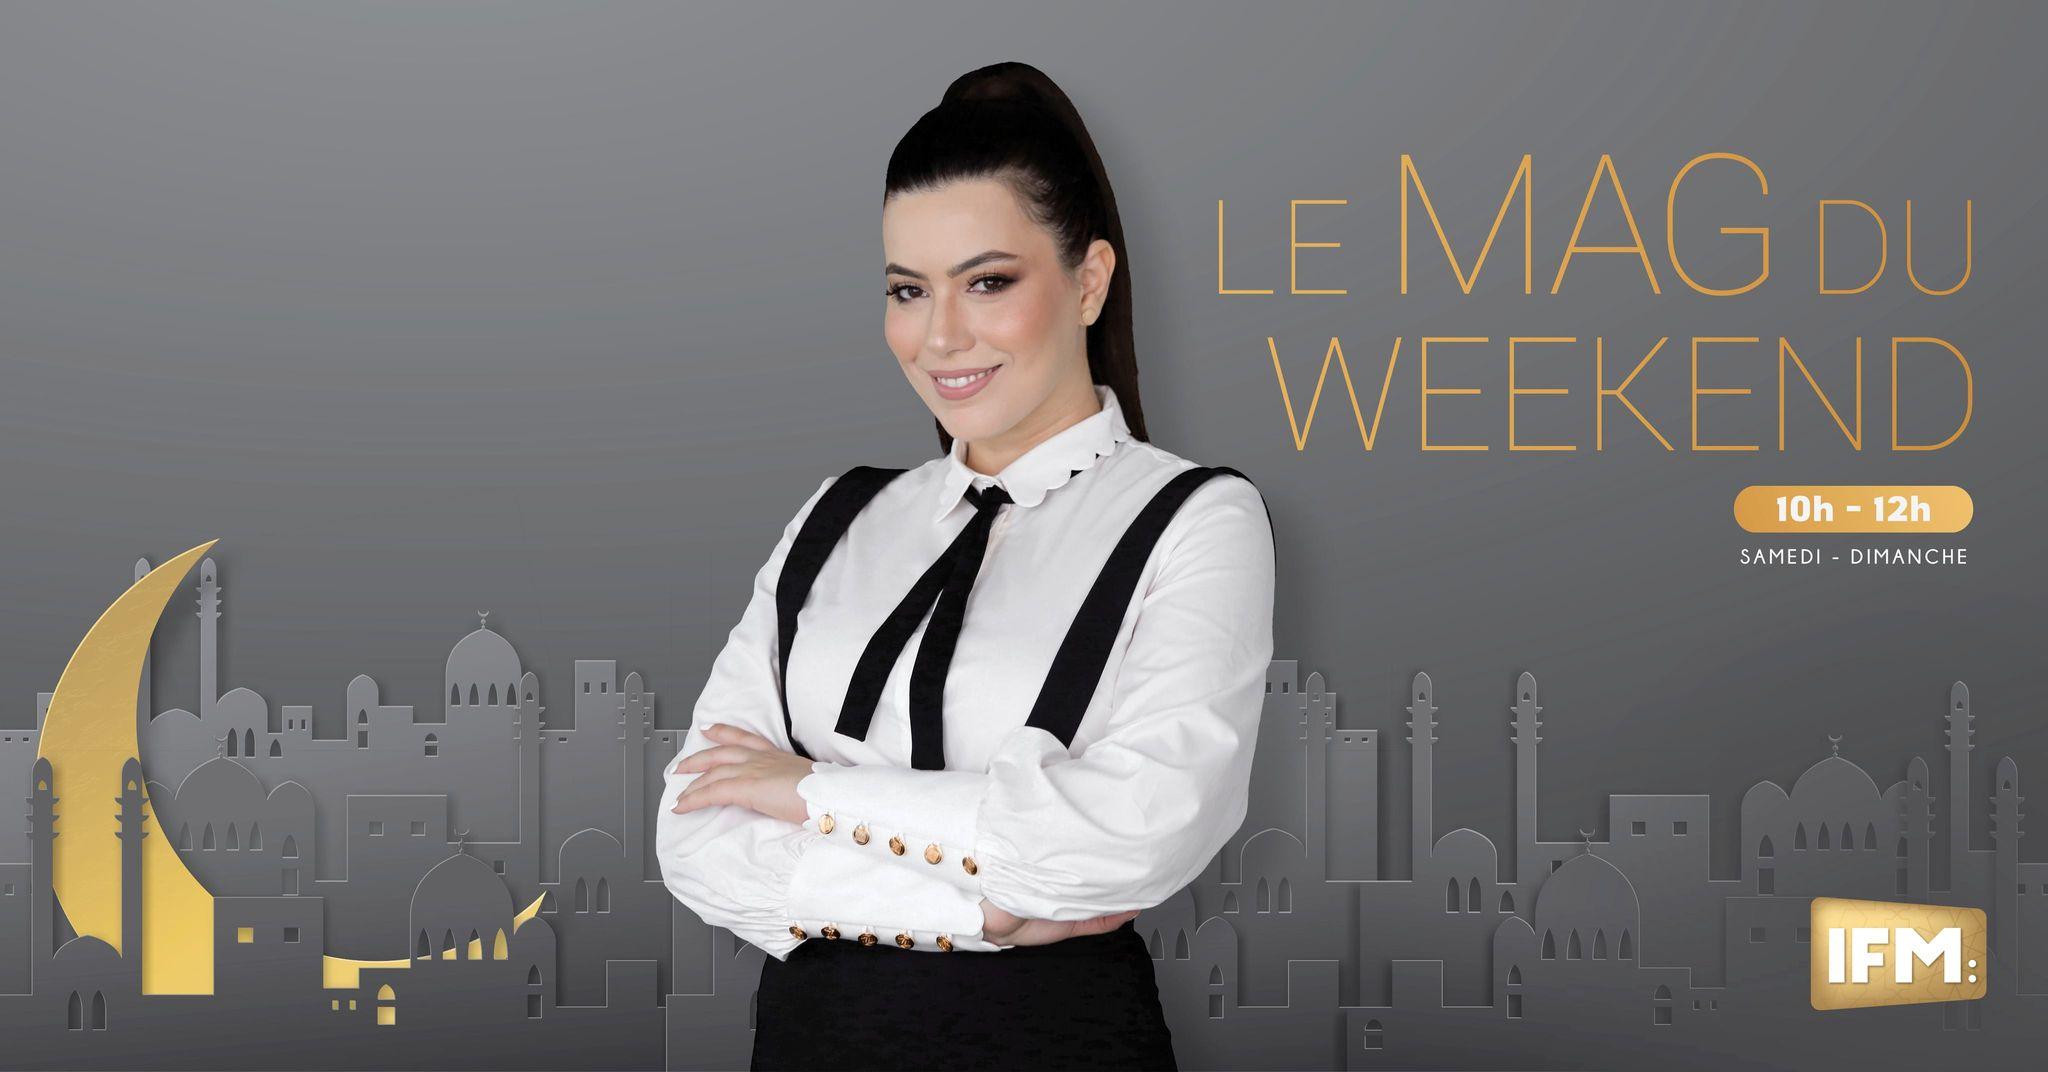 Matinale du Week End Mag du week-end